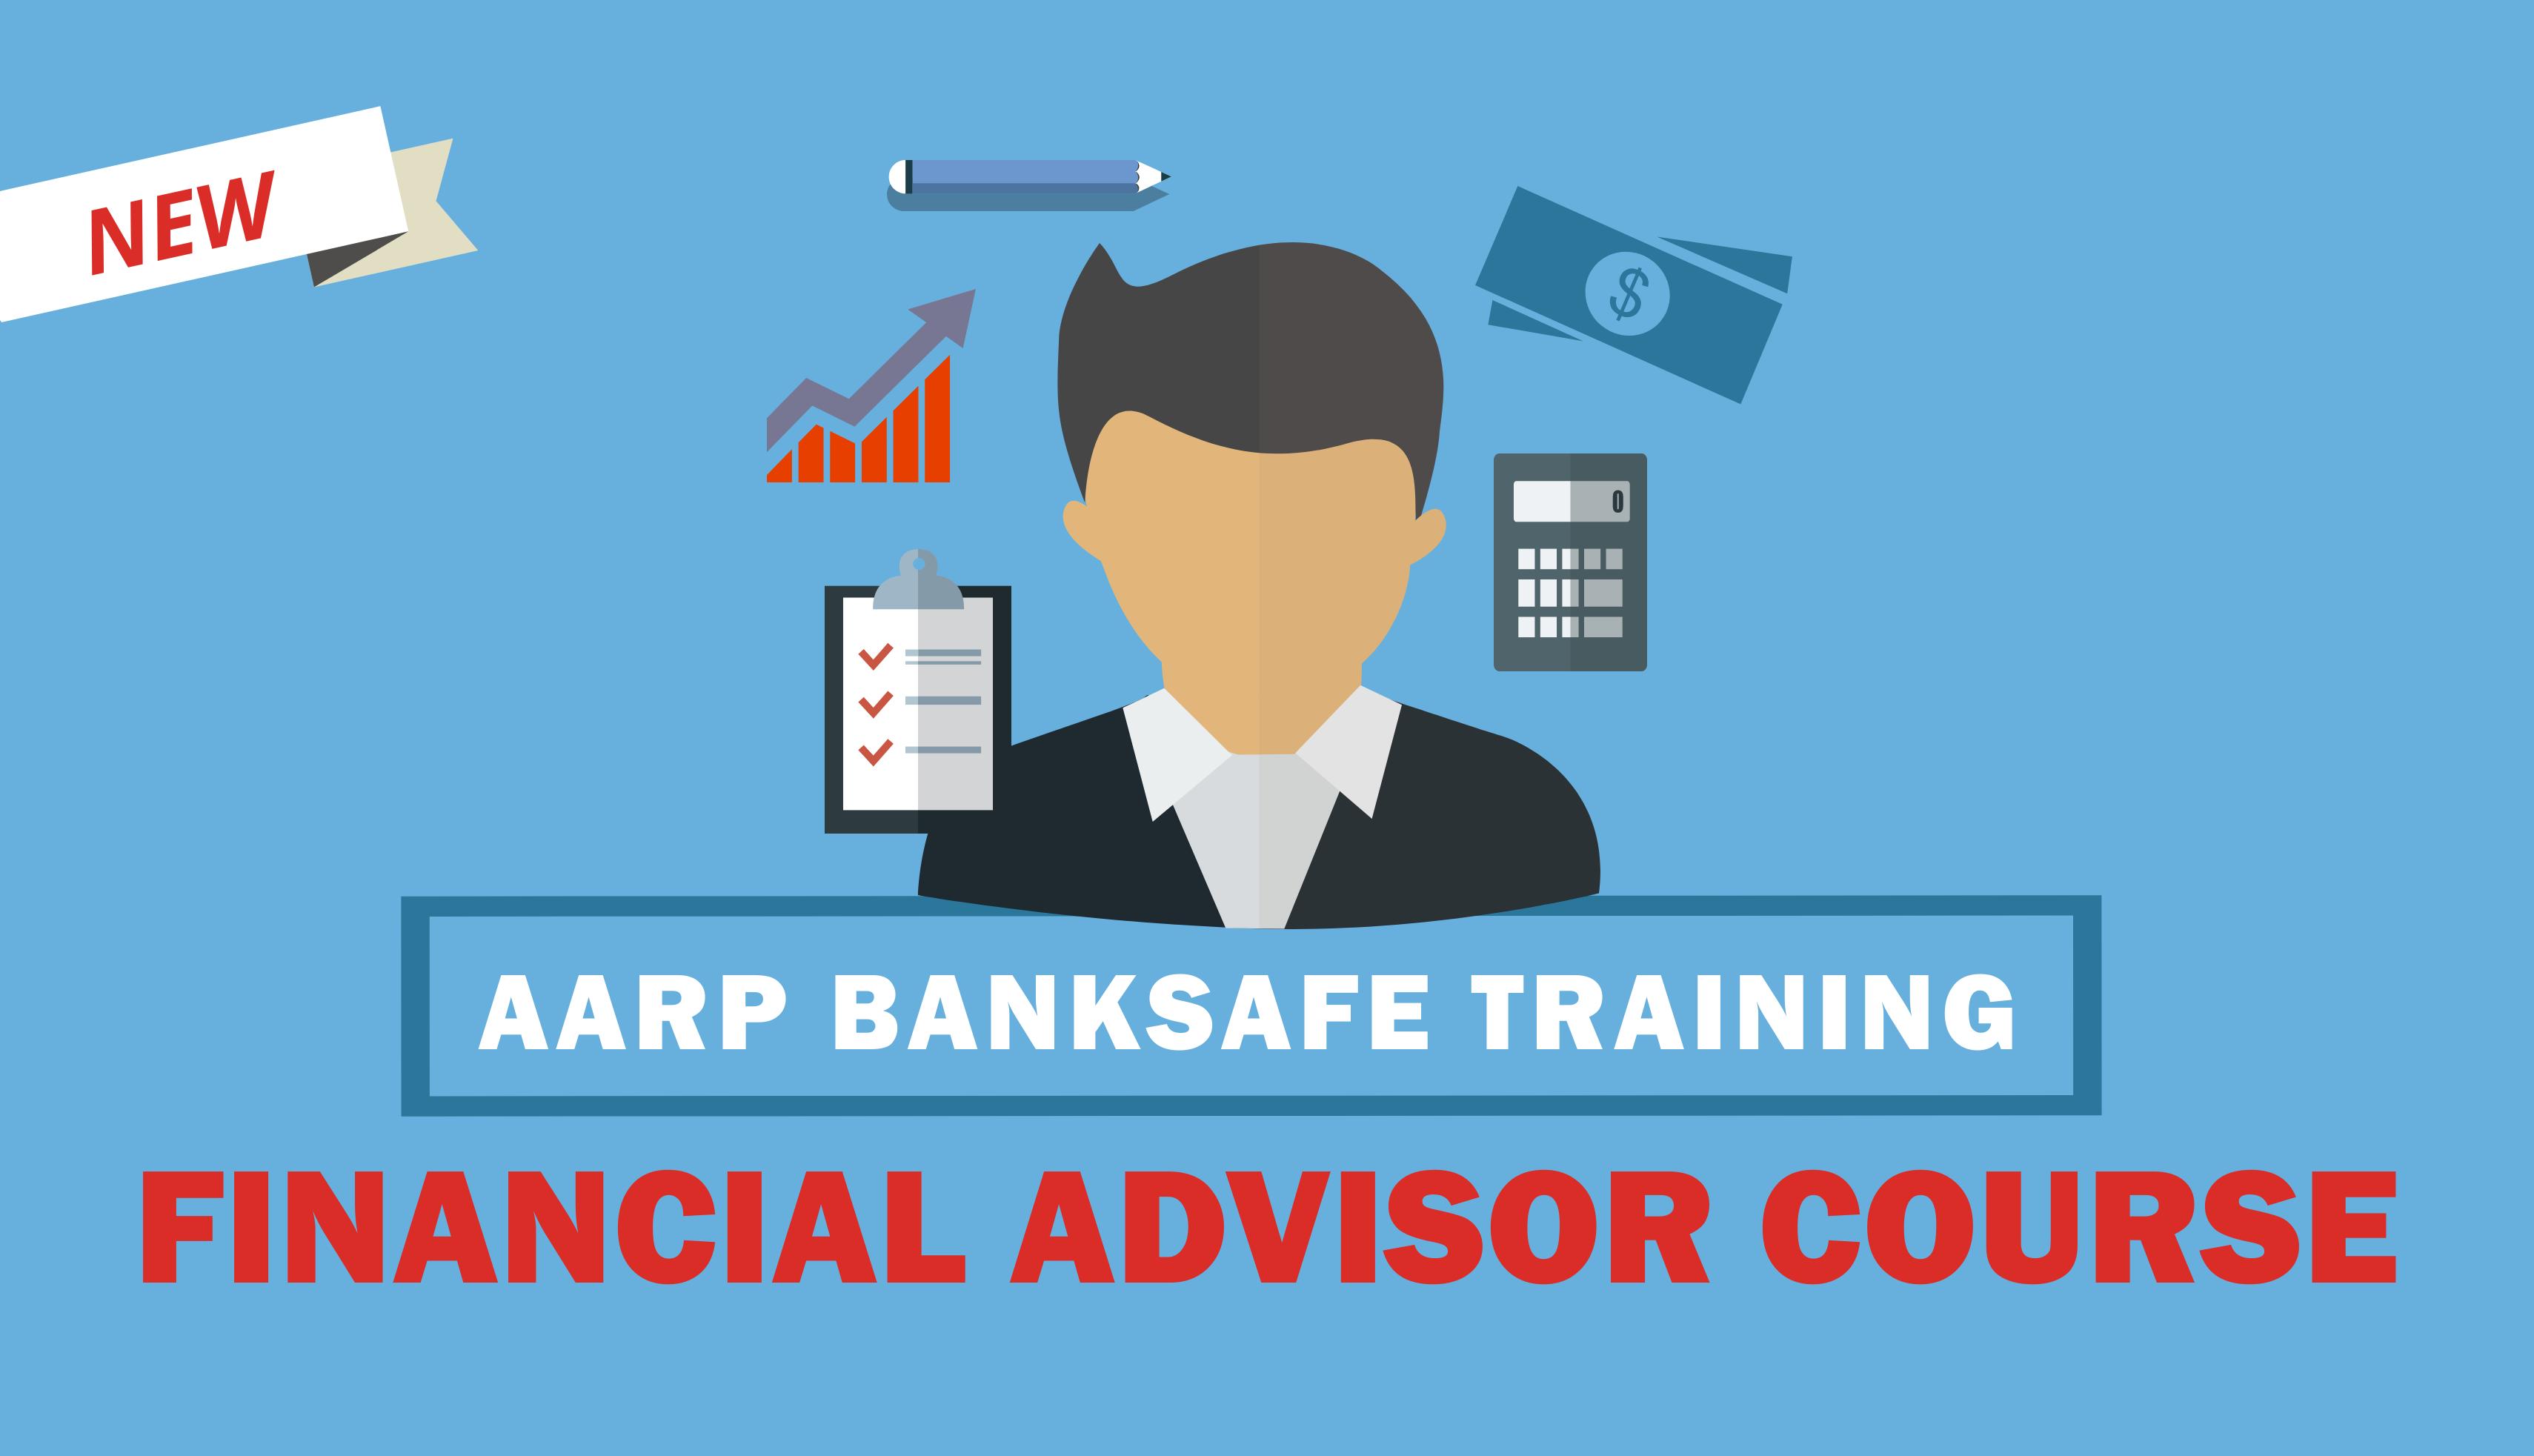 A A R P bank safe training financial advisor course